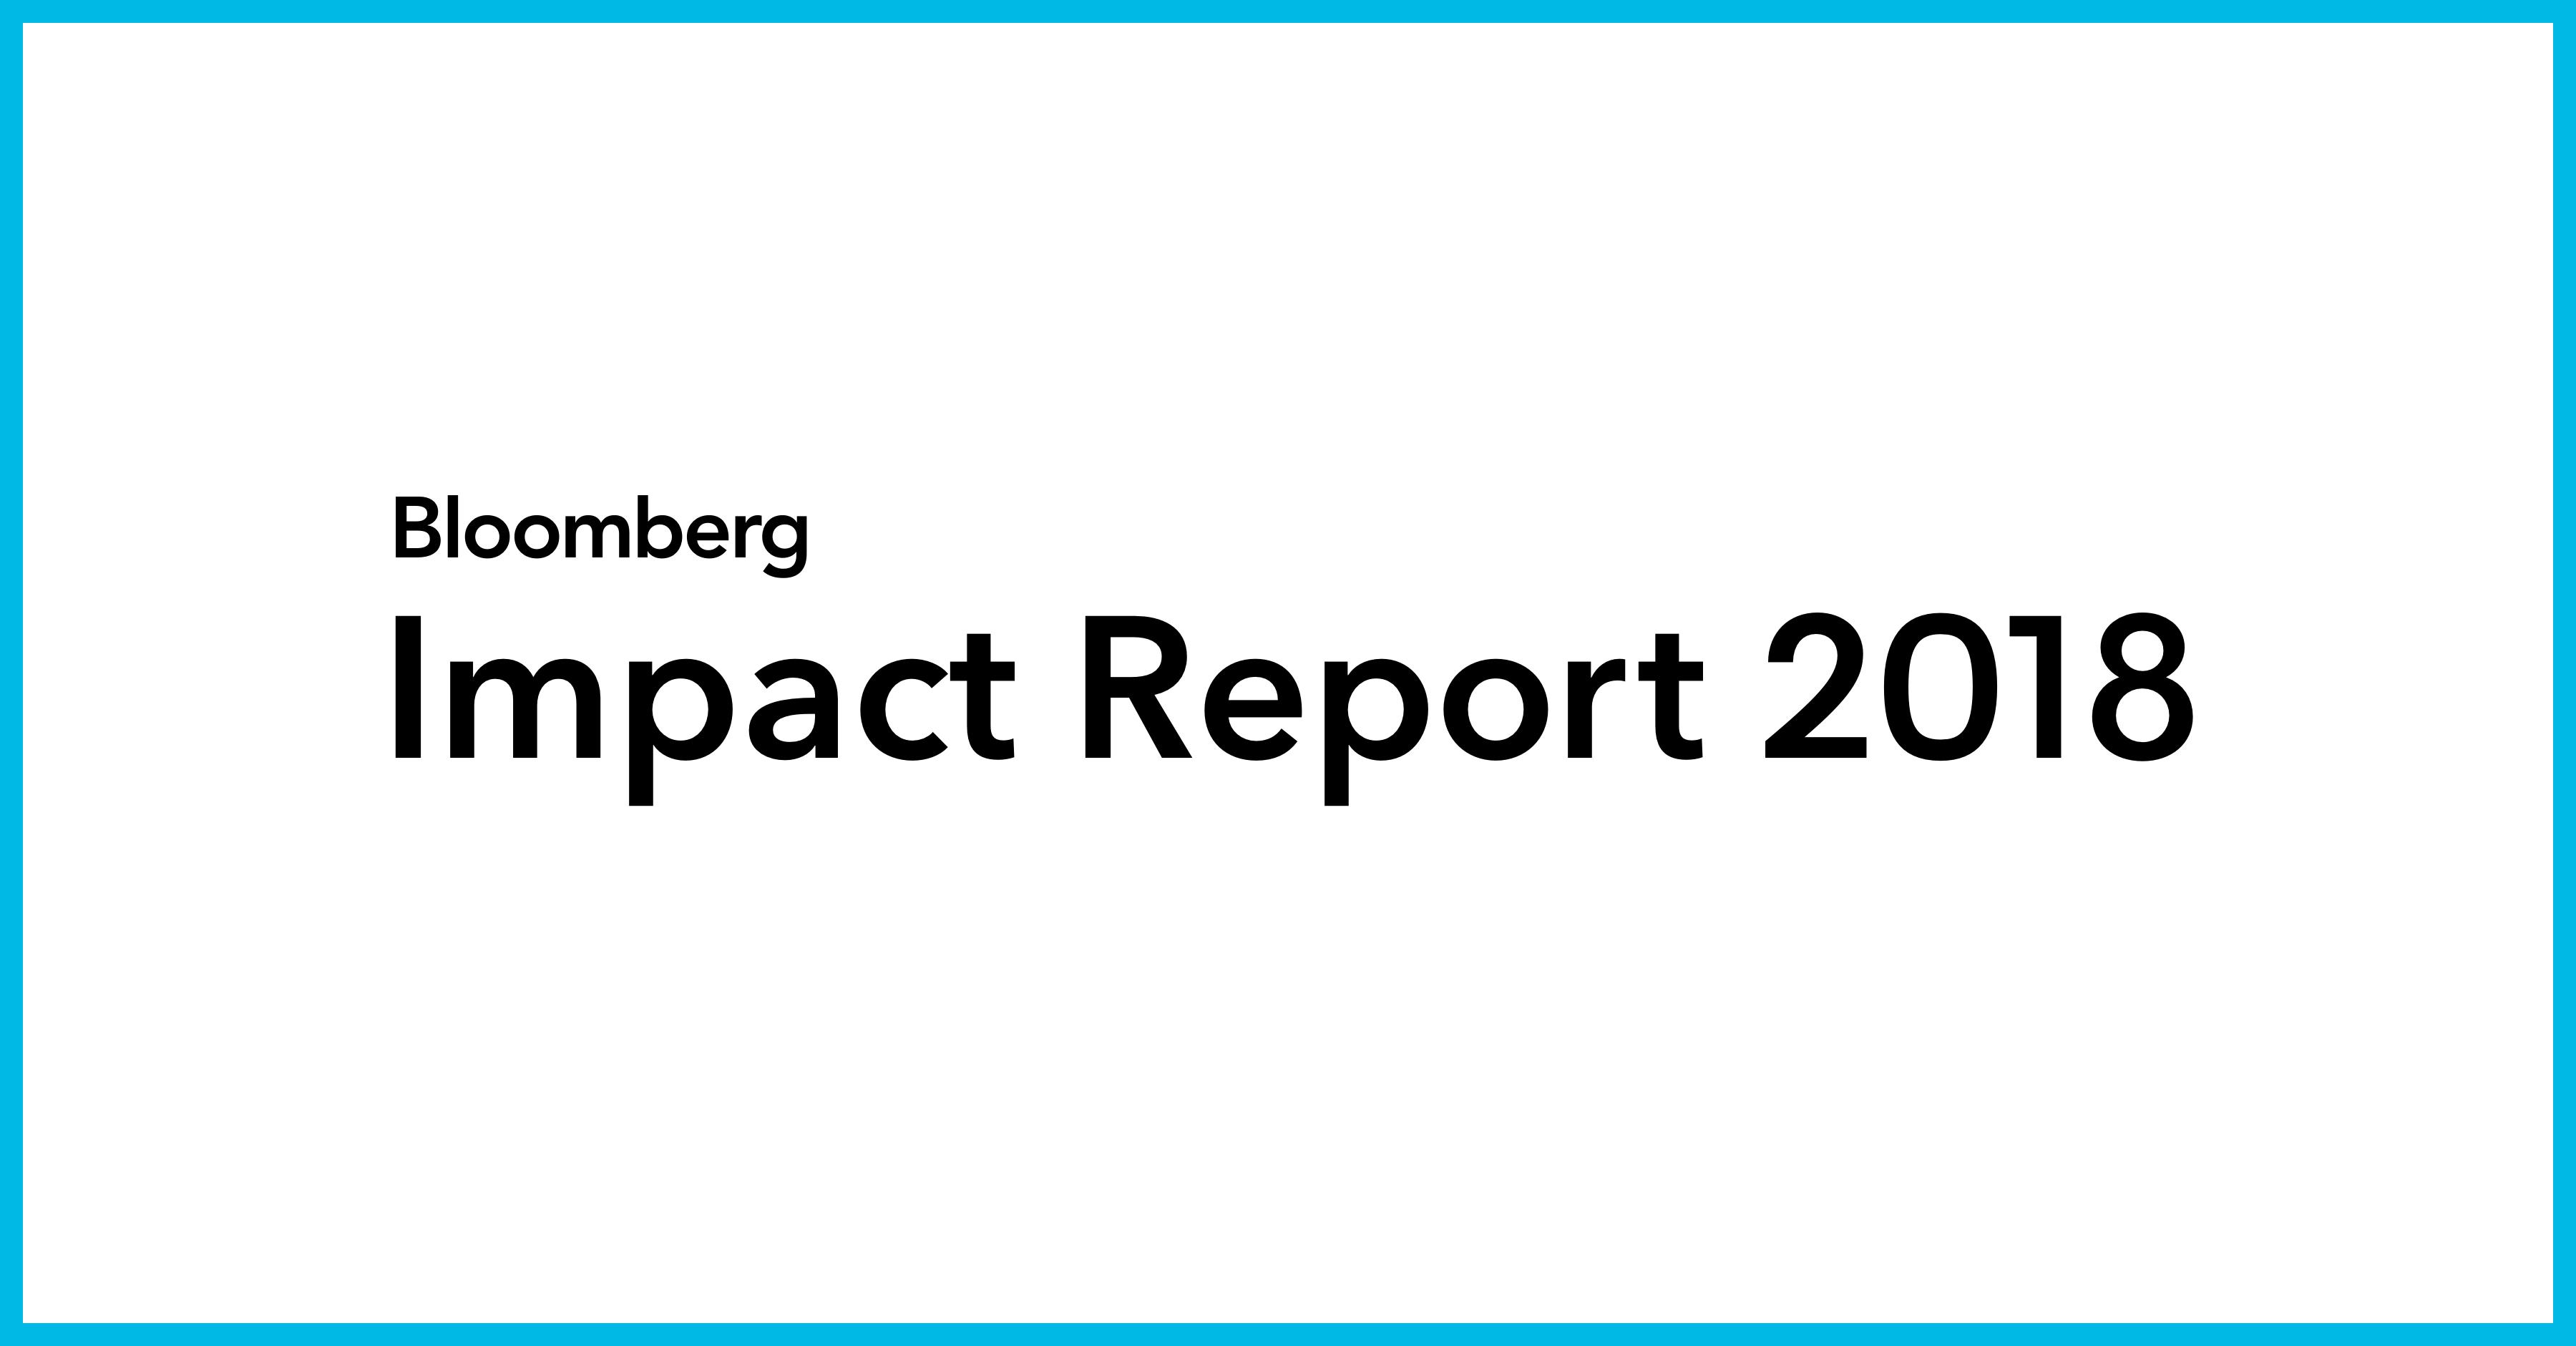 Bloomberg New Energy Finance | Bloomberg Impact Report